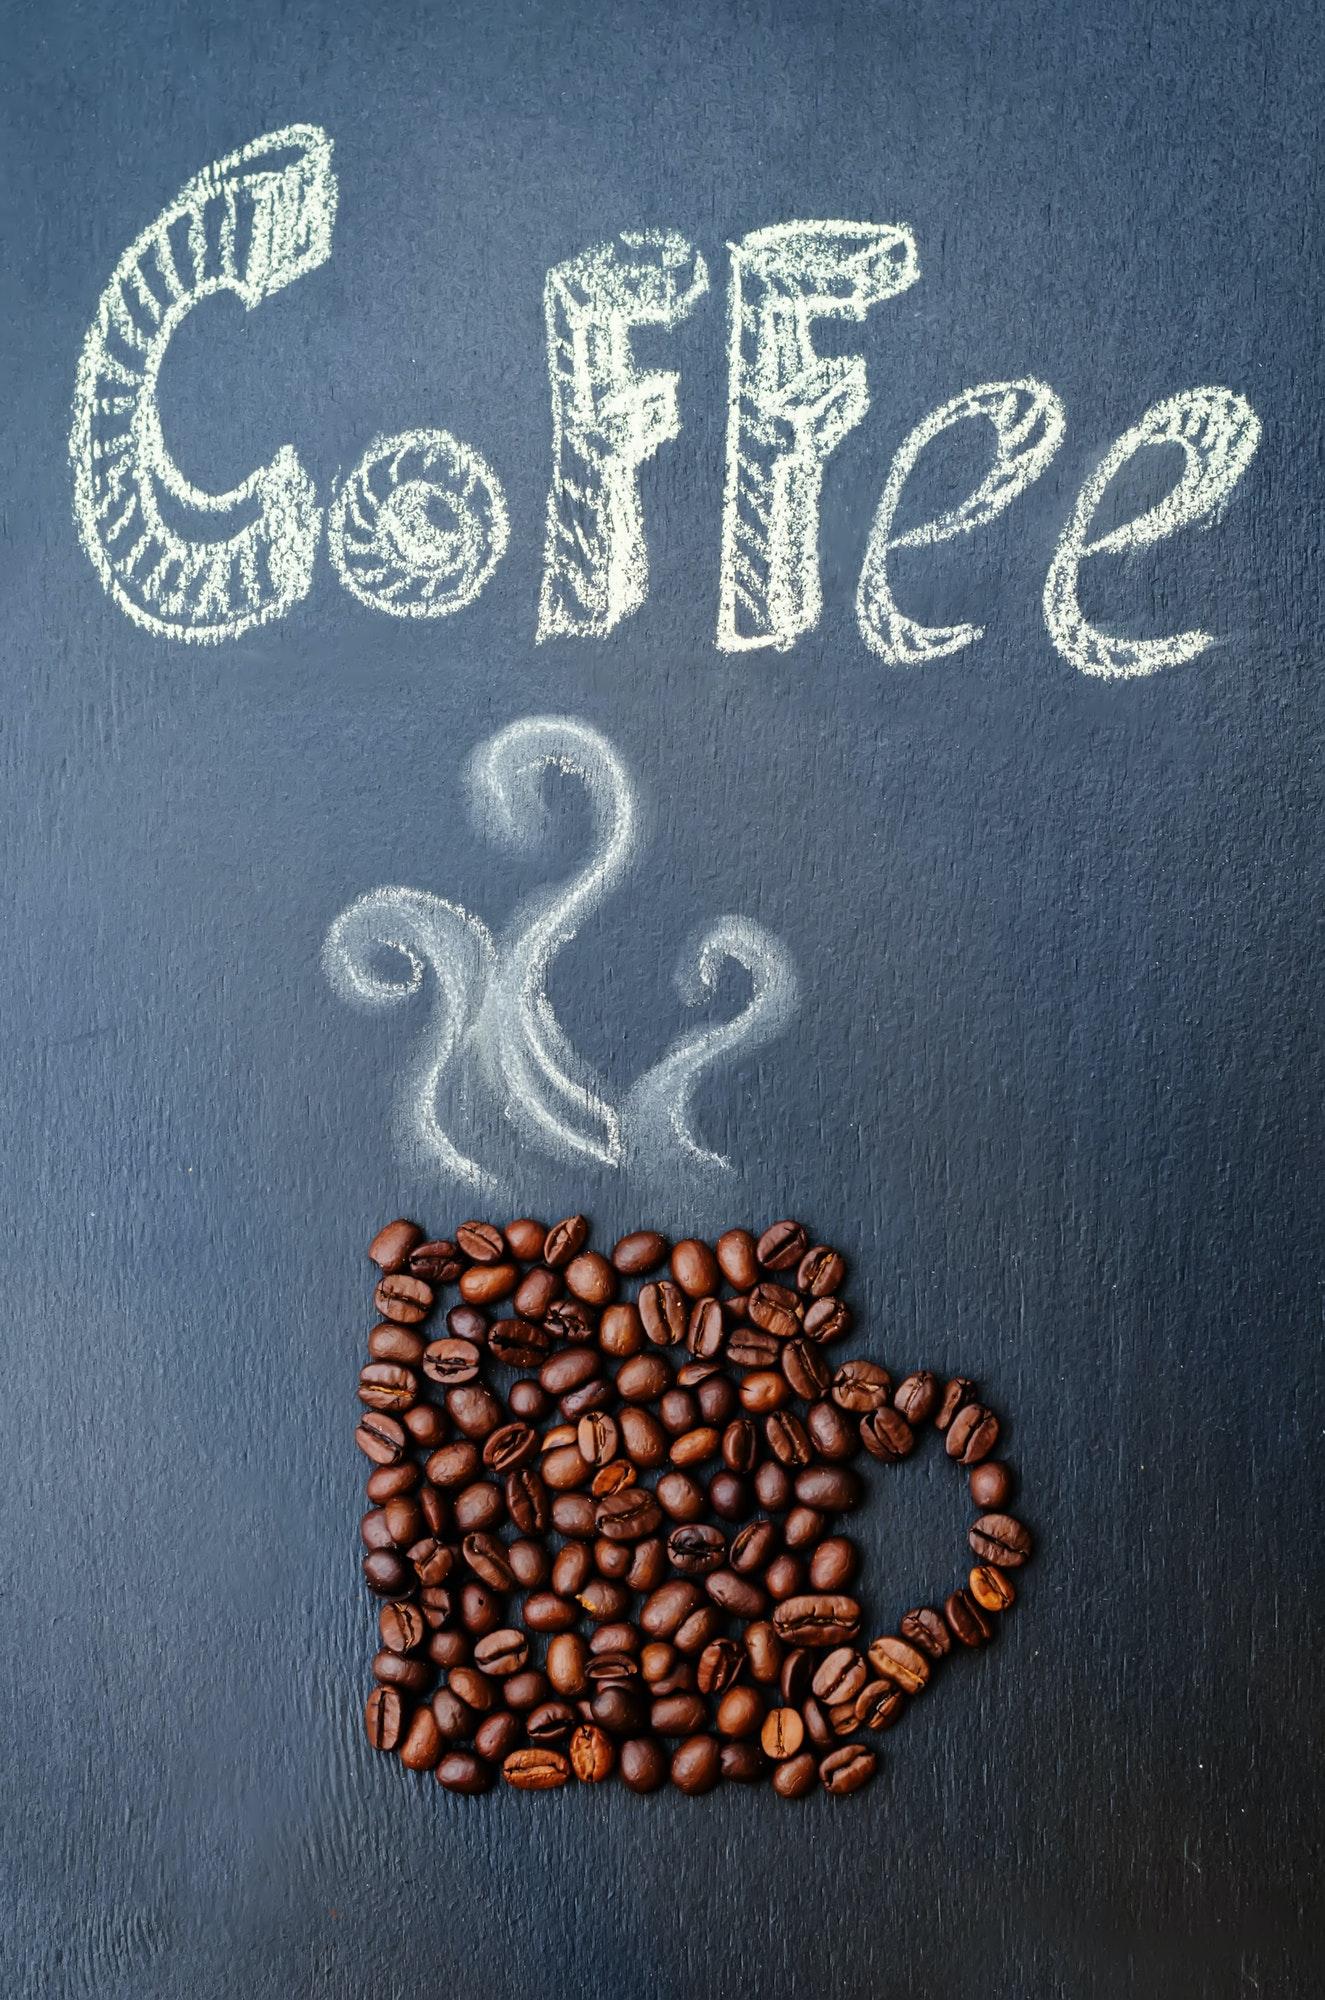 8 Surprising Health Benefits of Coffee